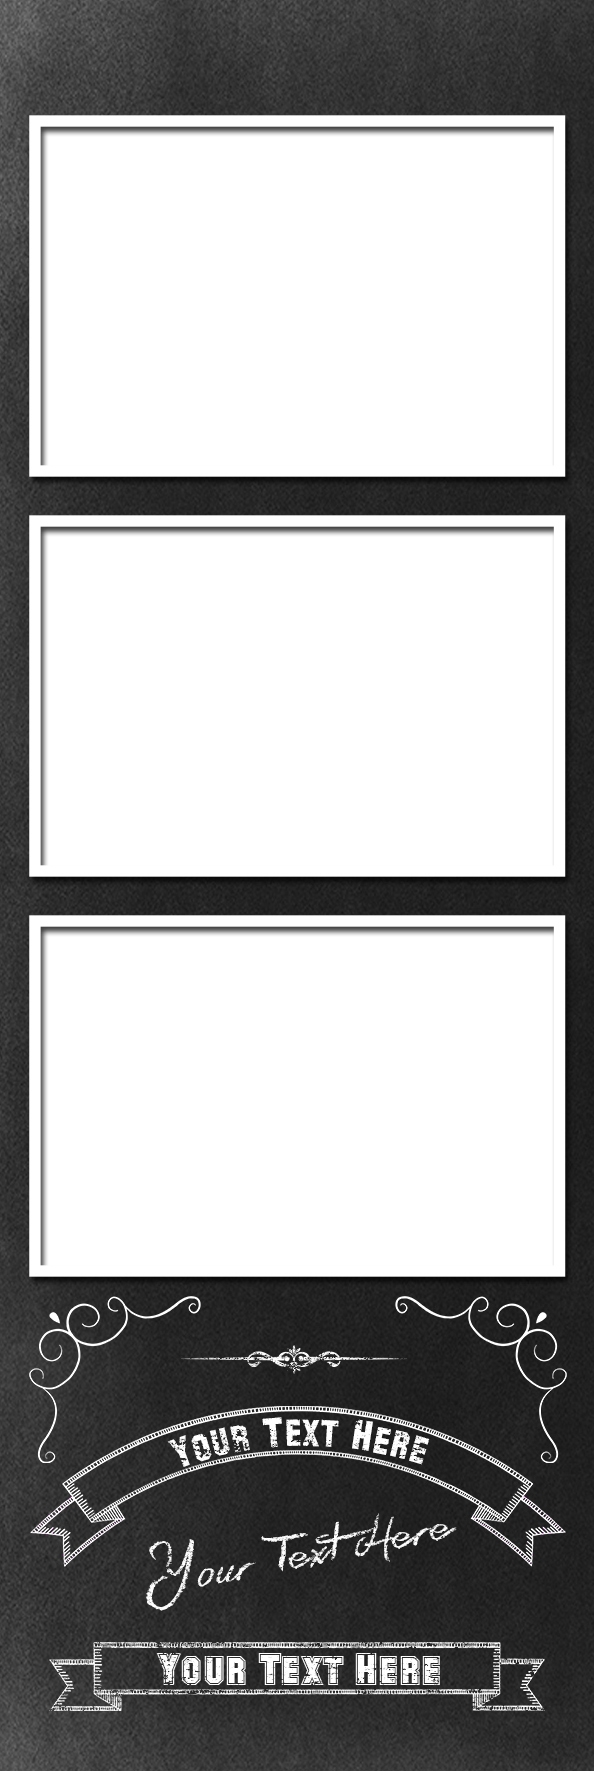 Texture_Chalkboard-V-6P.jpg